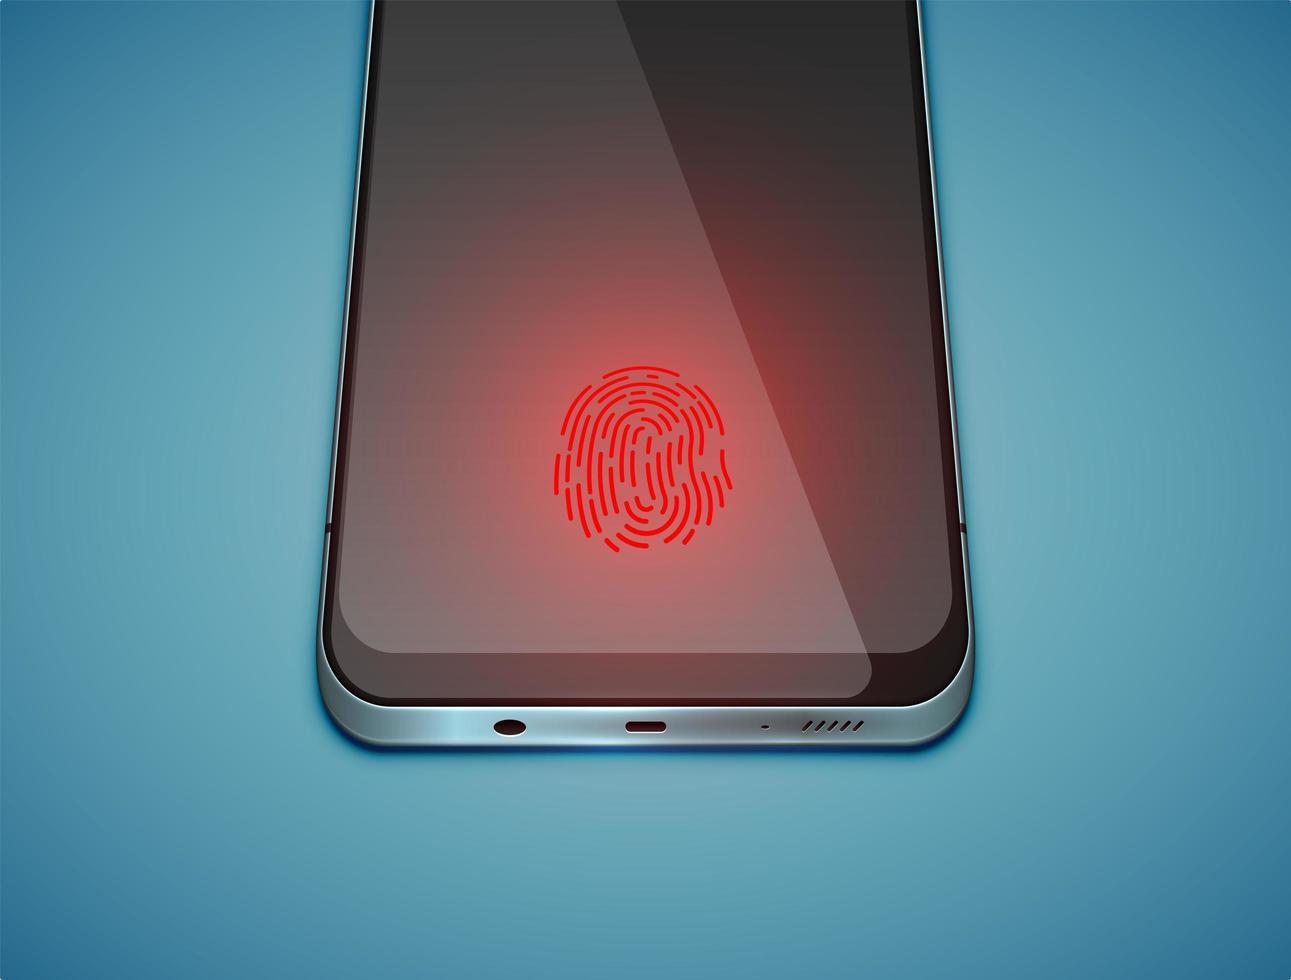 roter Fingerabdrucksensor auf dem Display vektor